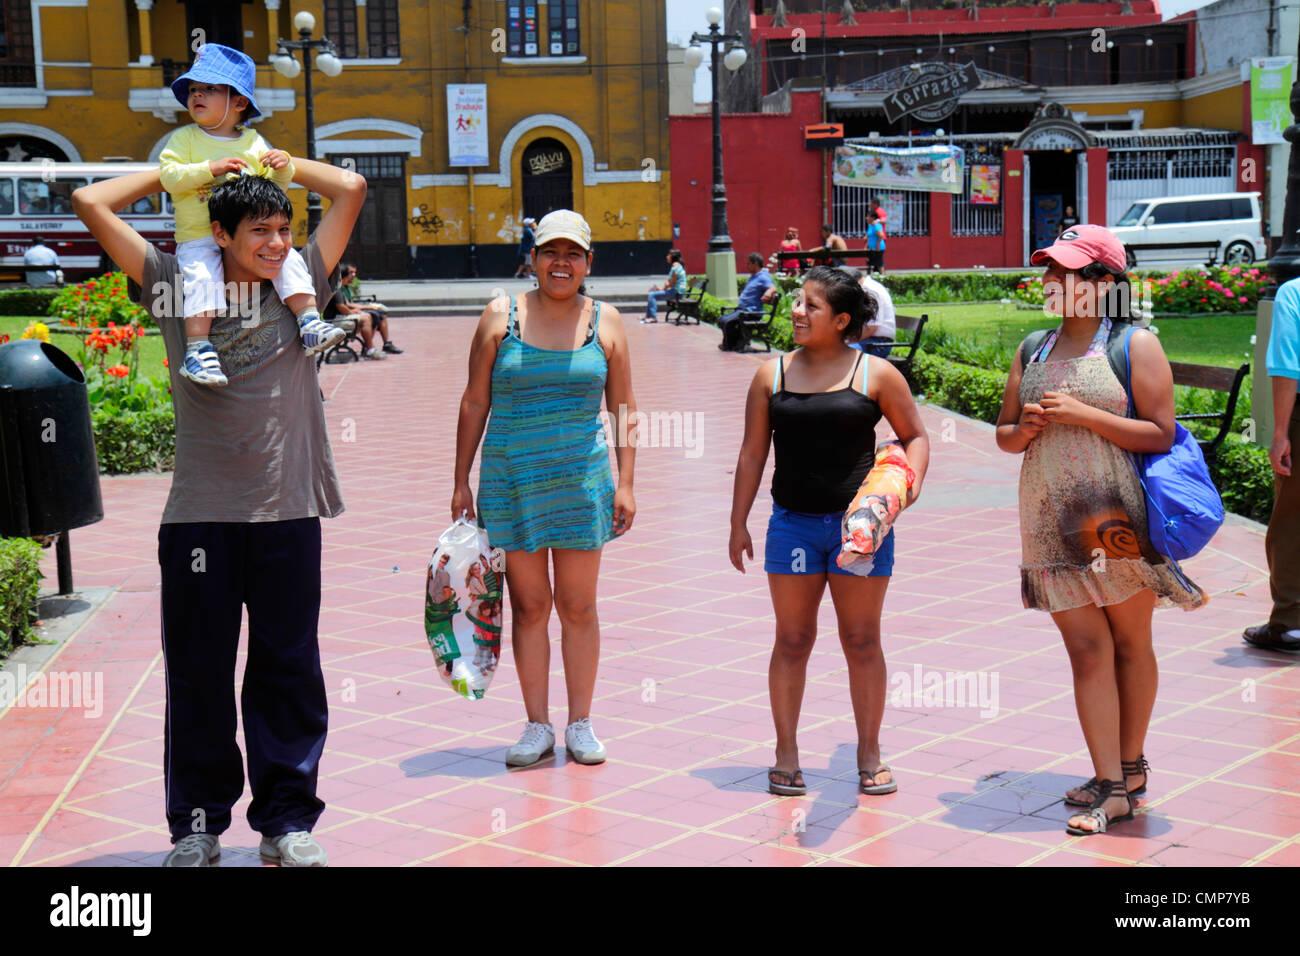 Lima peru barranco district parque municipal urban park open space promenade hispanic girl boy teen toddler